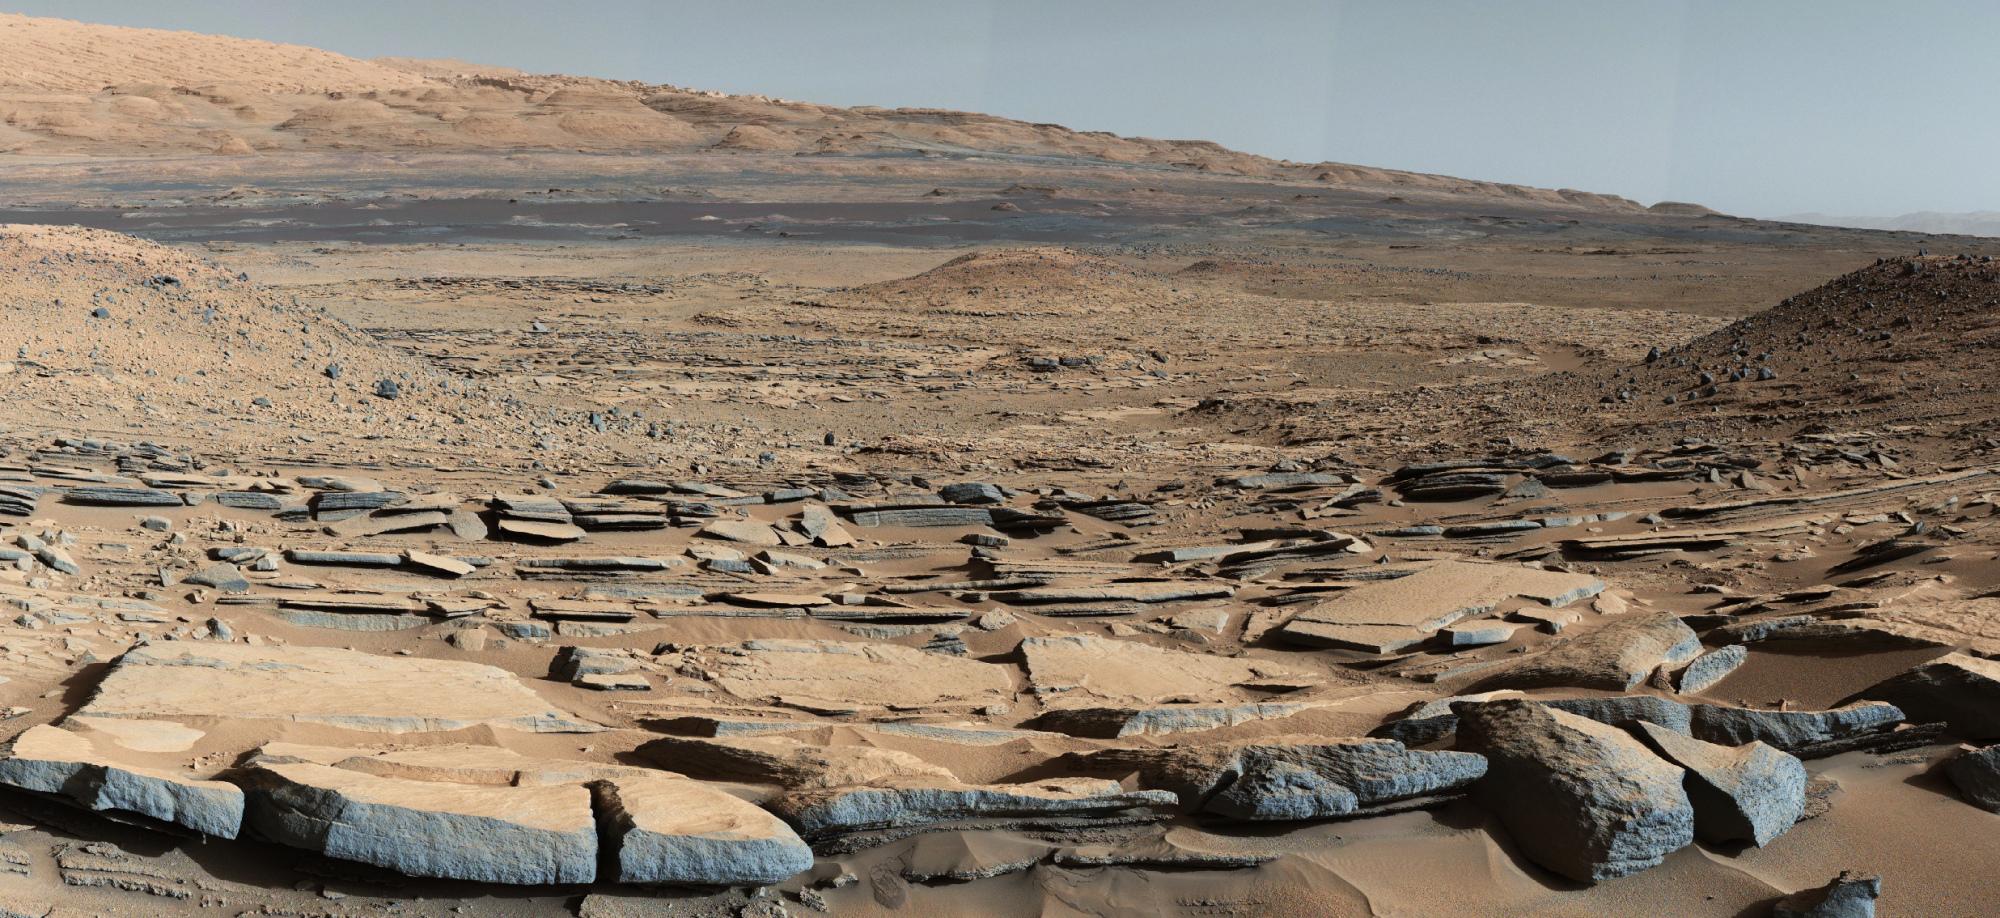 mars-curiosity-rover-gale-crater-beauty-shot-pia19839.thumb.jpg.09014aefbc21f1d66c0680a14f5979fc.jpg